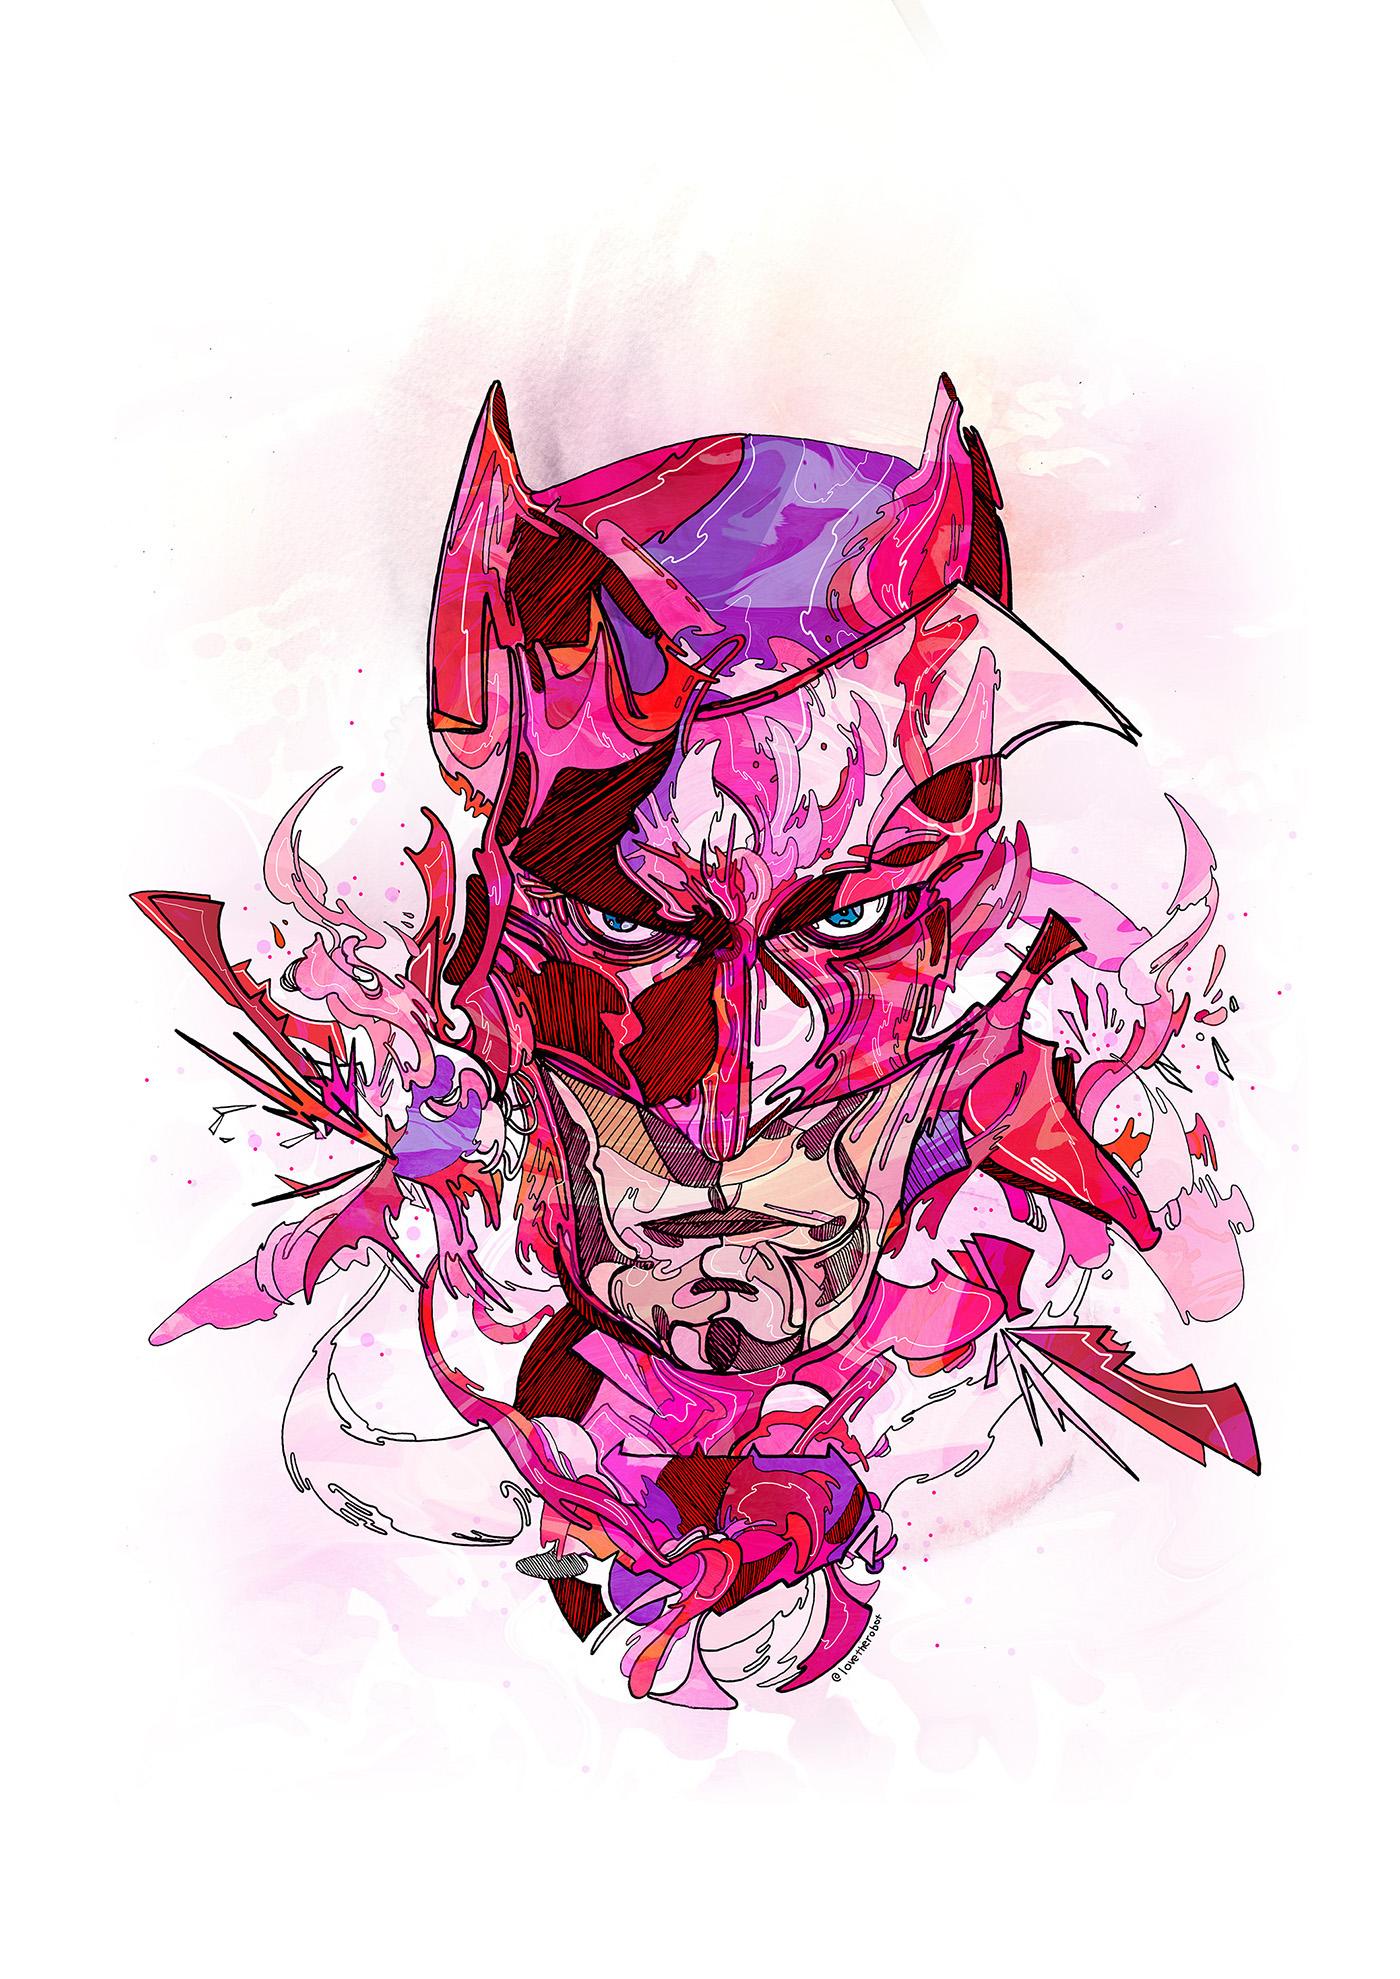 Adobe Portfolio batman superman Ninja Turtles X Men Conor McGregor marvel Dc Comics